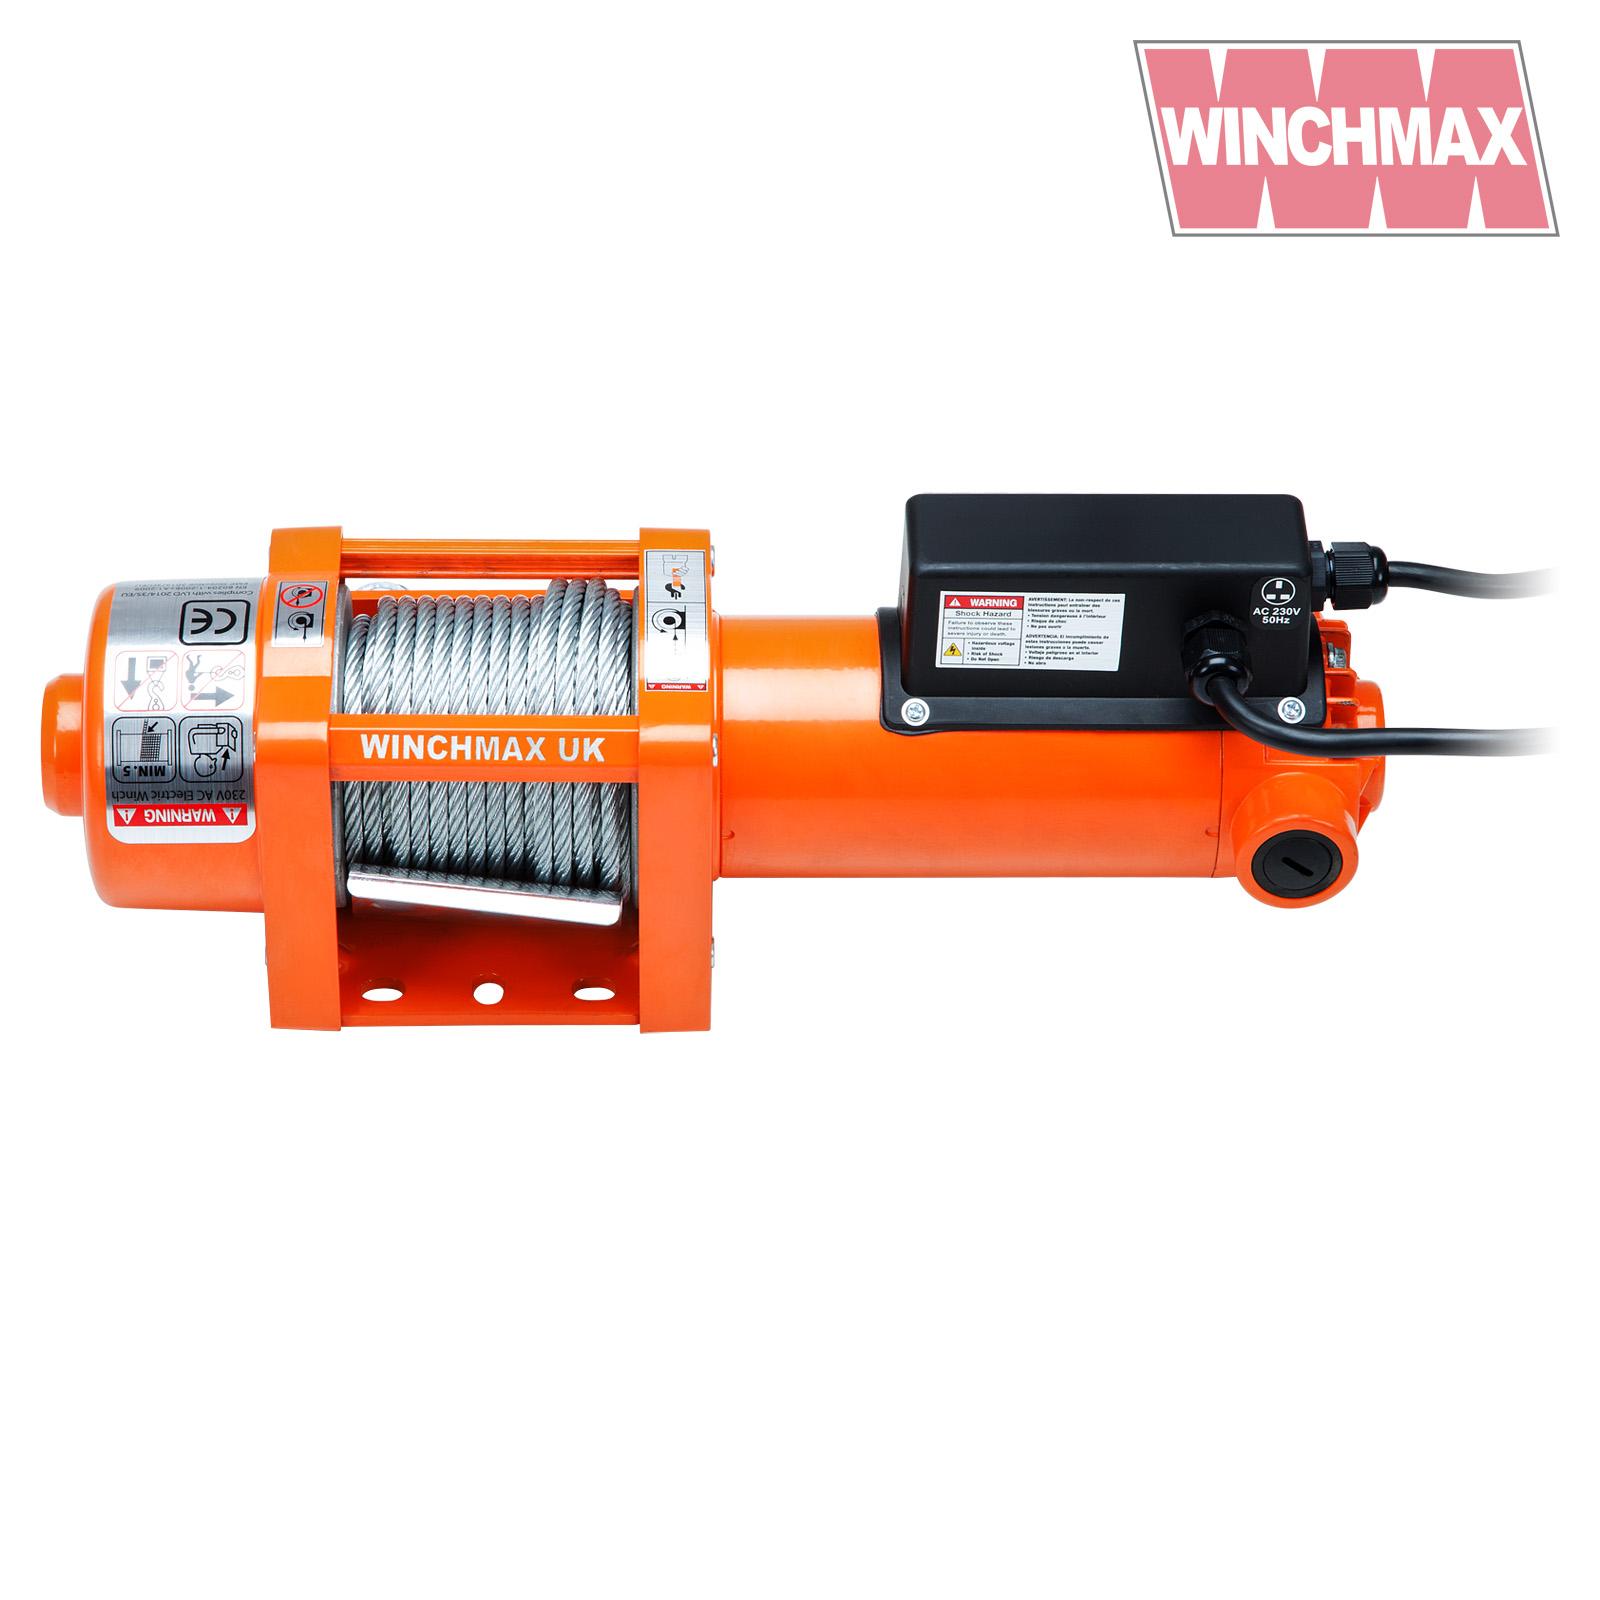 Wmac3000 winchmax 227